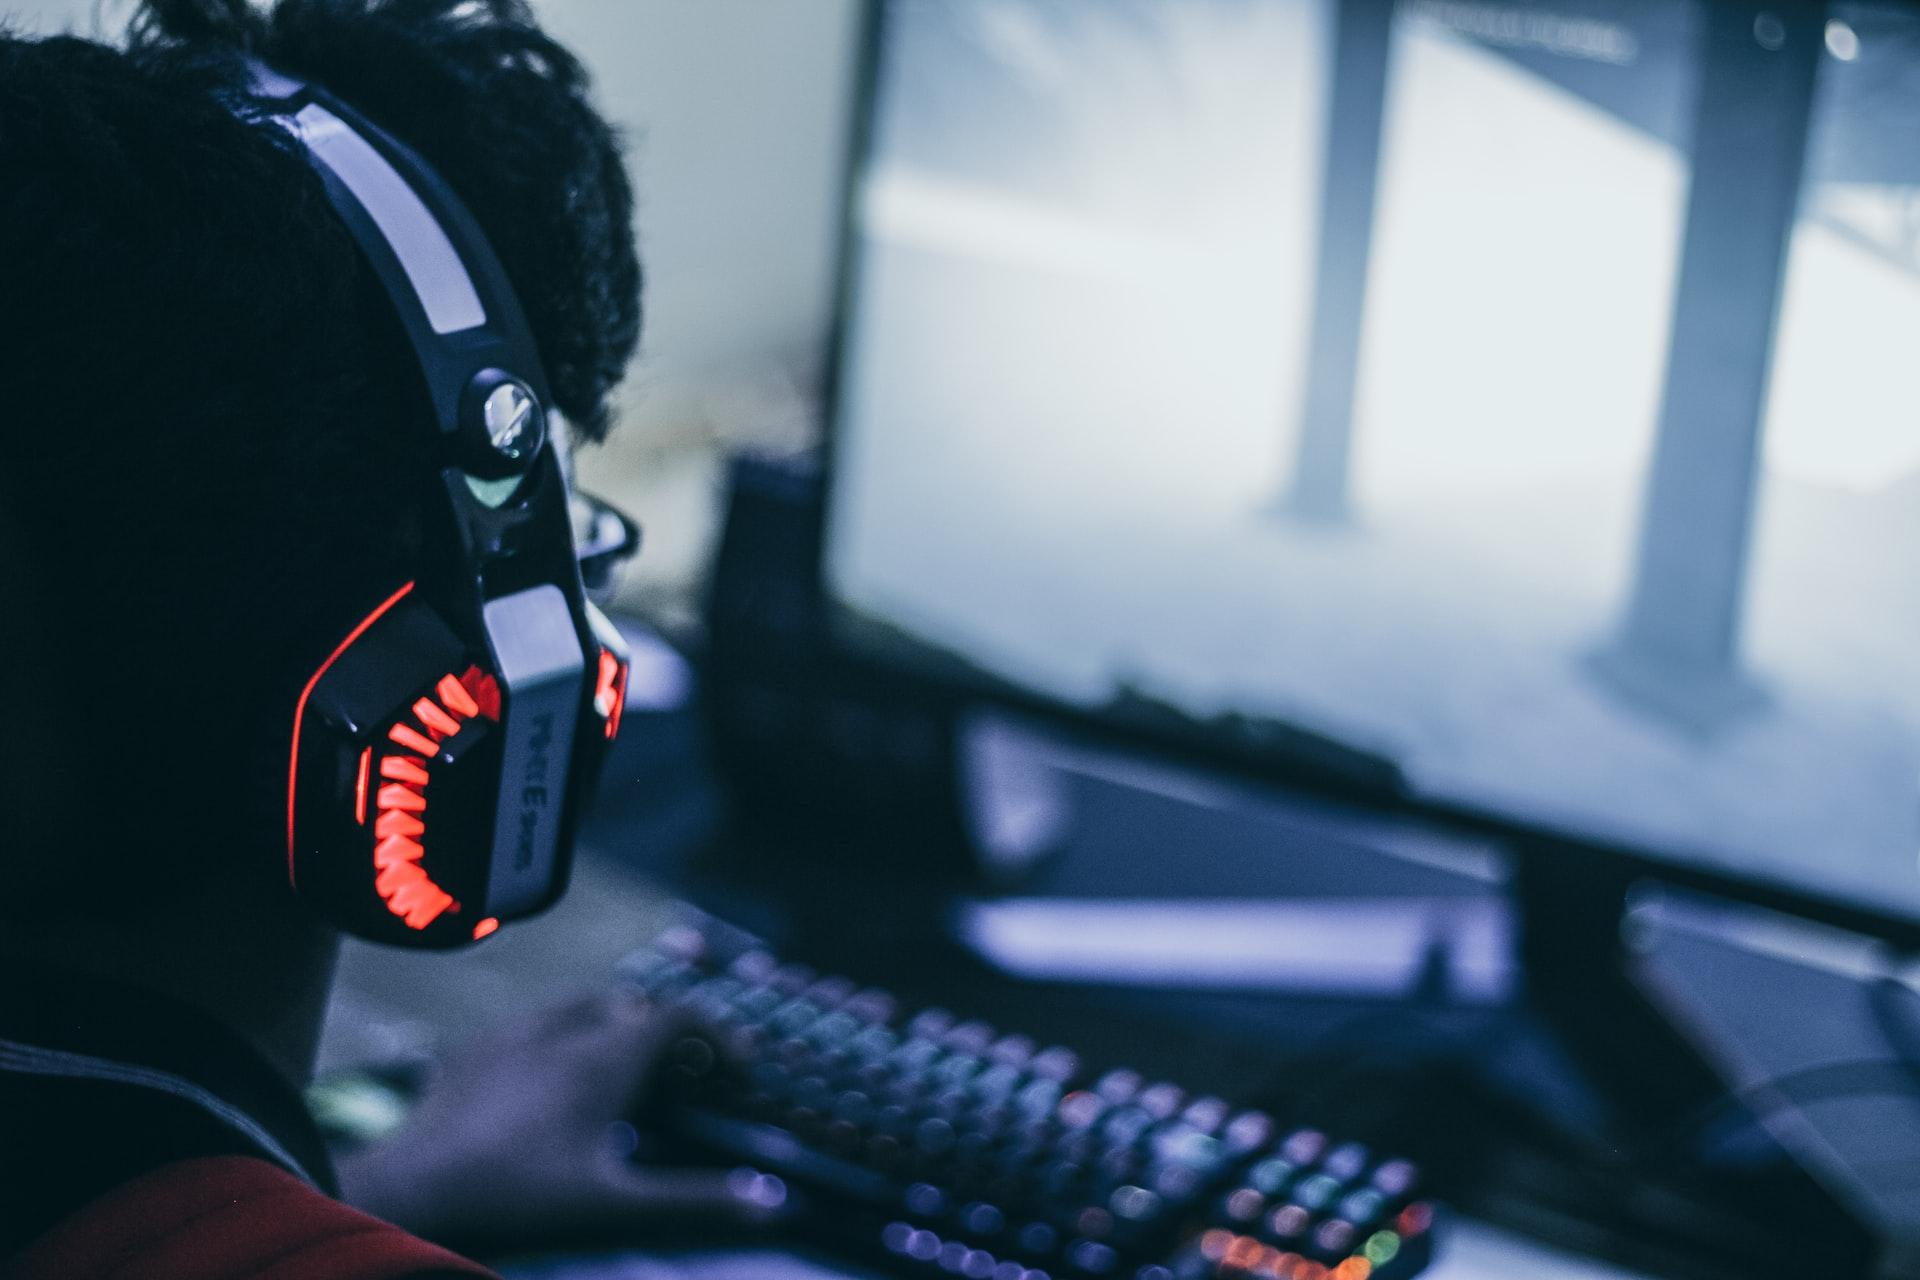 fredrick tendong 6ou8gWpS9ns unsplash 5 Best Gaming Headphones Under 2000